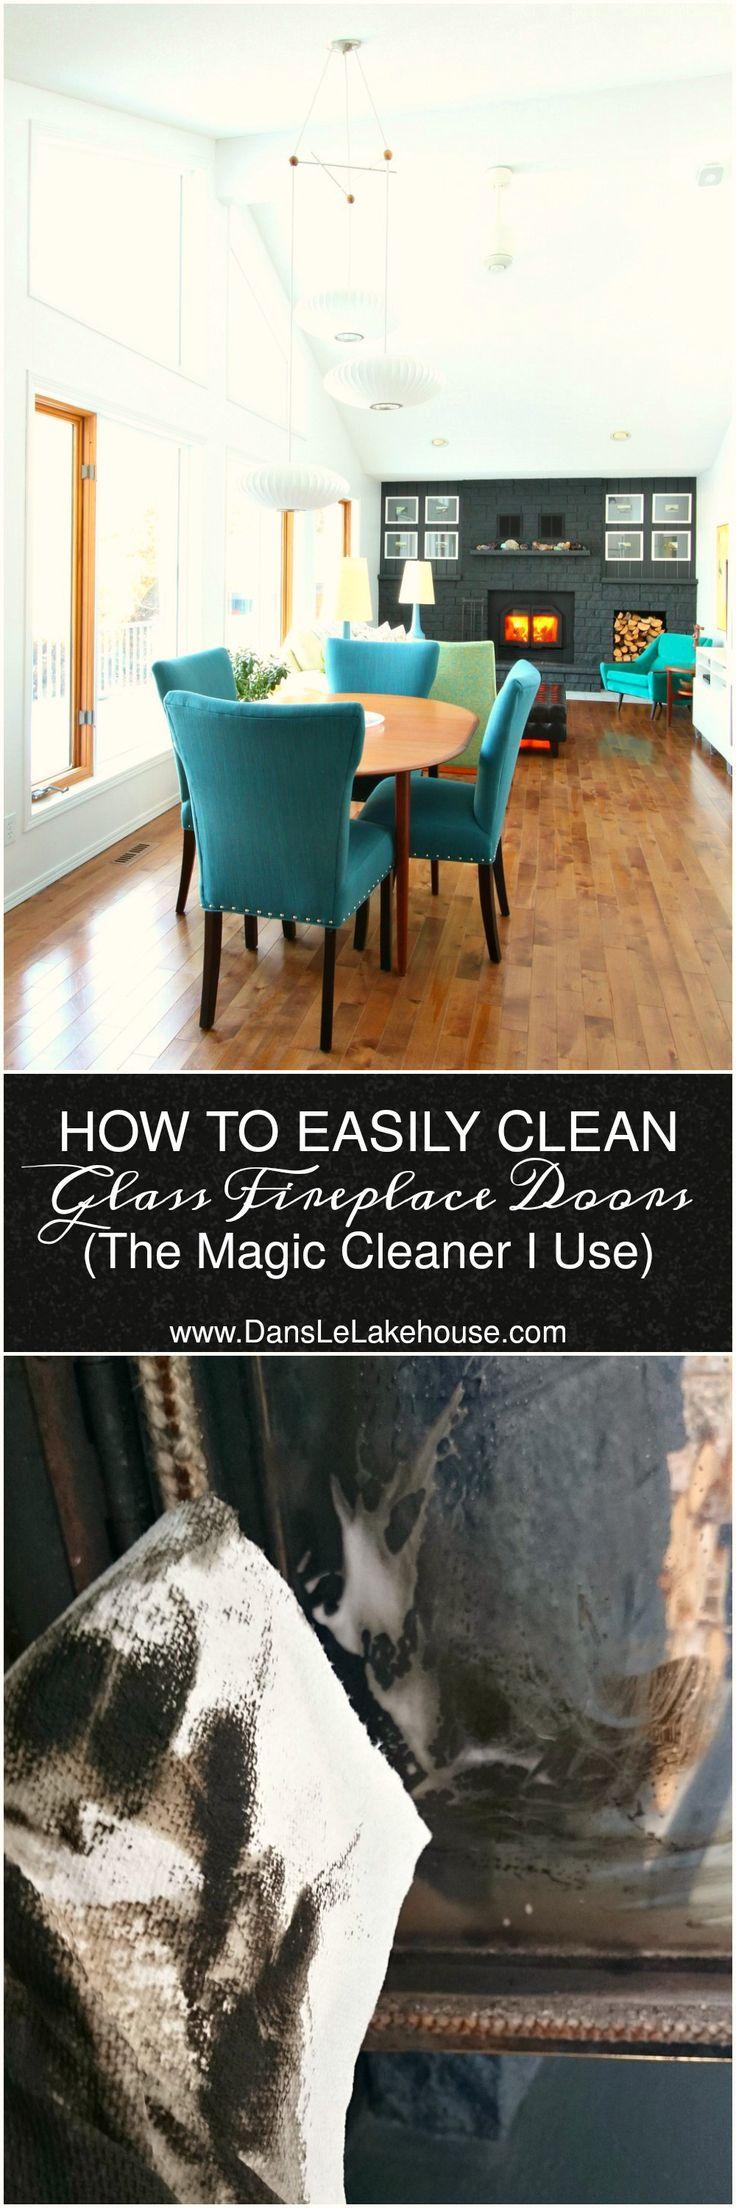 25 Best Ideas About Fireplace Doors On Pinterest